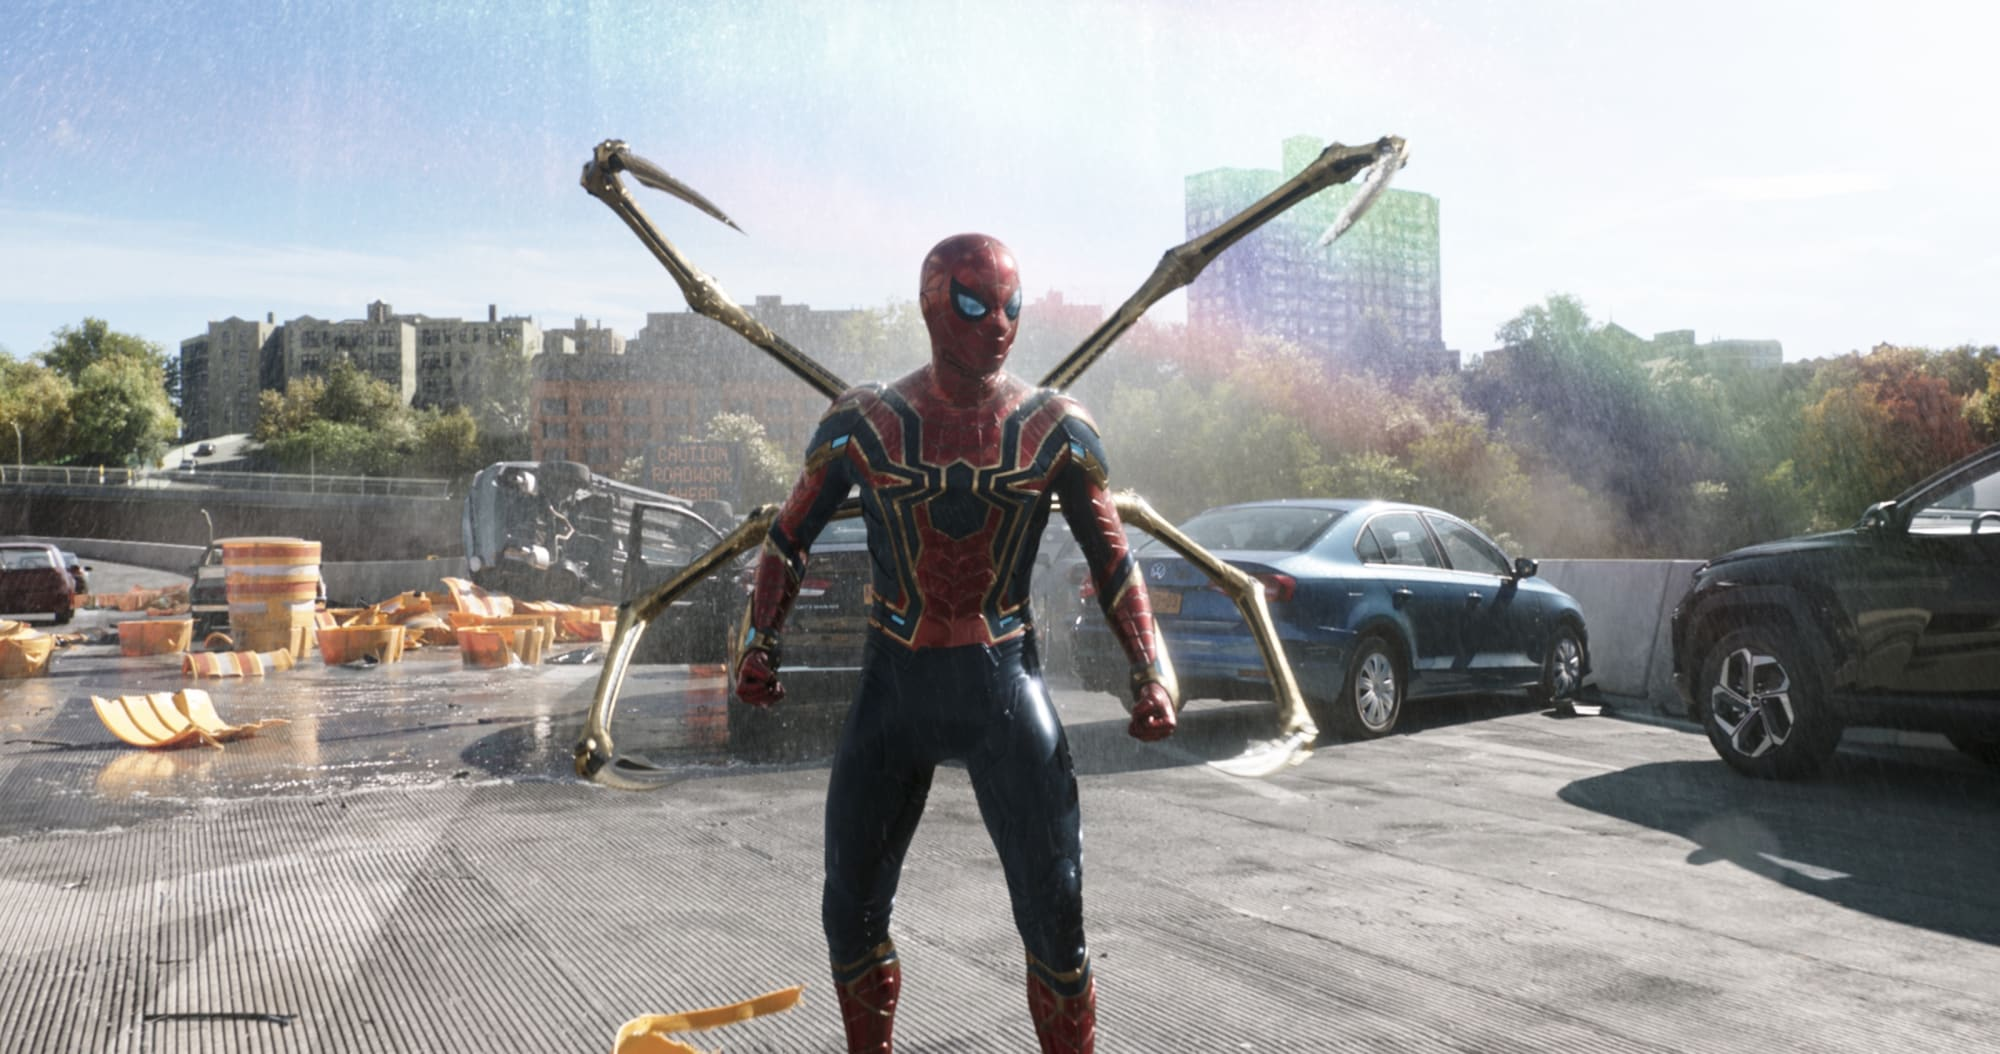 Spider-Man 3: All three Spider-Men unite in astonishing new No Way Home trailer